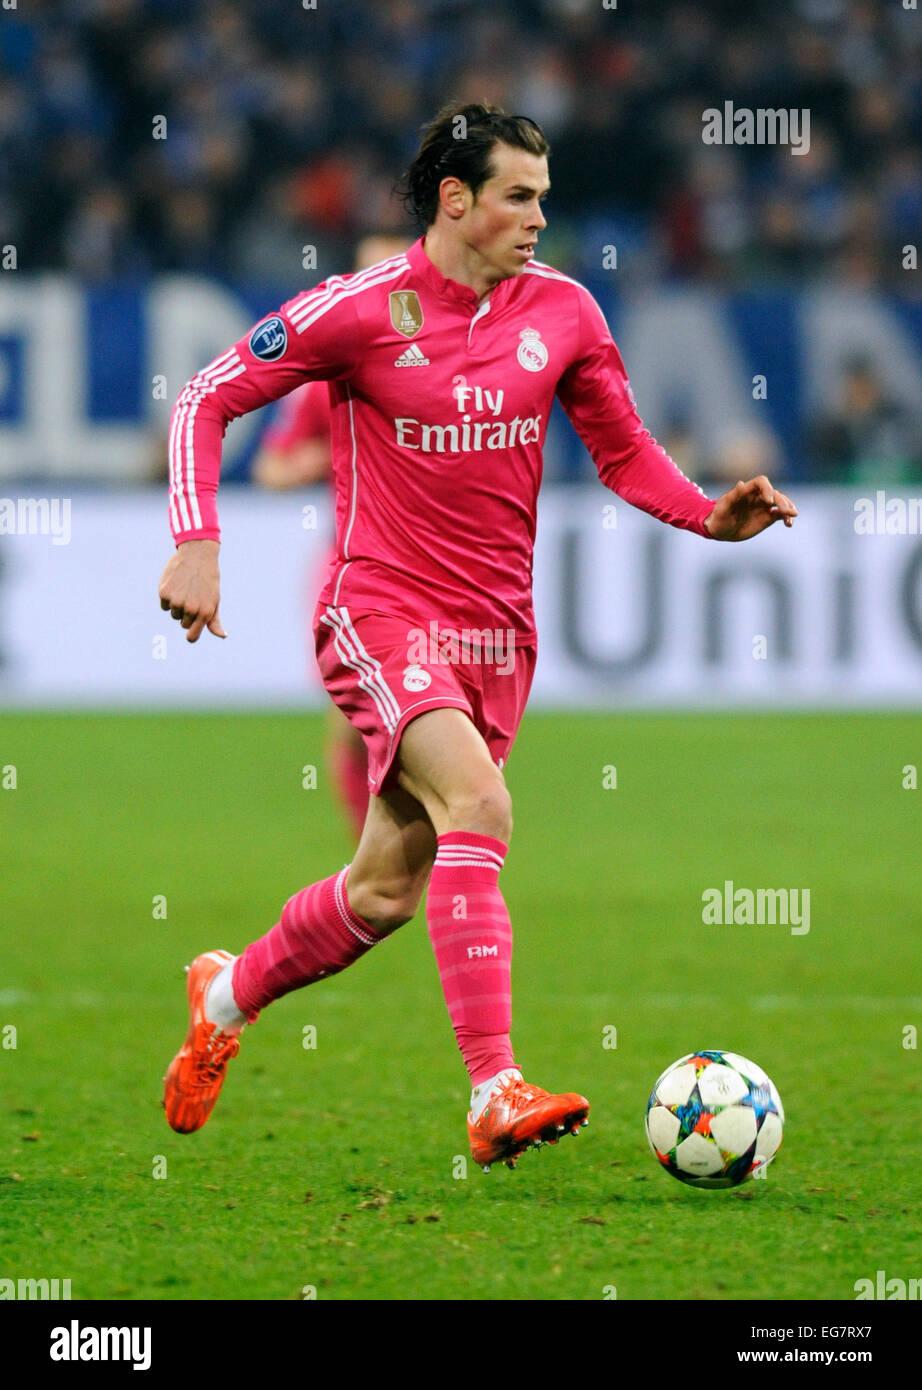 Gelsenkirchen, Germany. 18th February, 2015. UEFA Champions League: FC Schalke 04, S04 (blue) - Real Madrid (Pink) - Stock Image